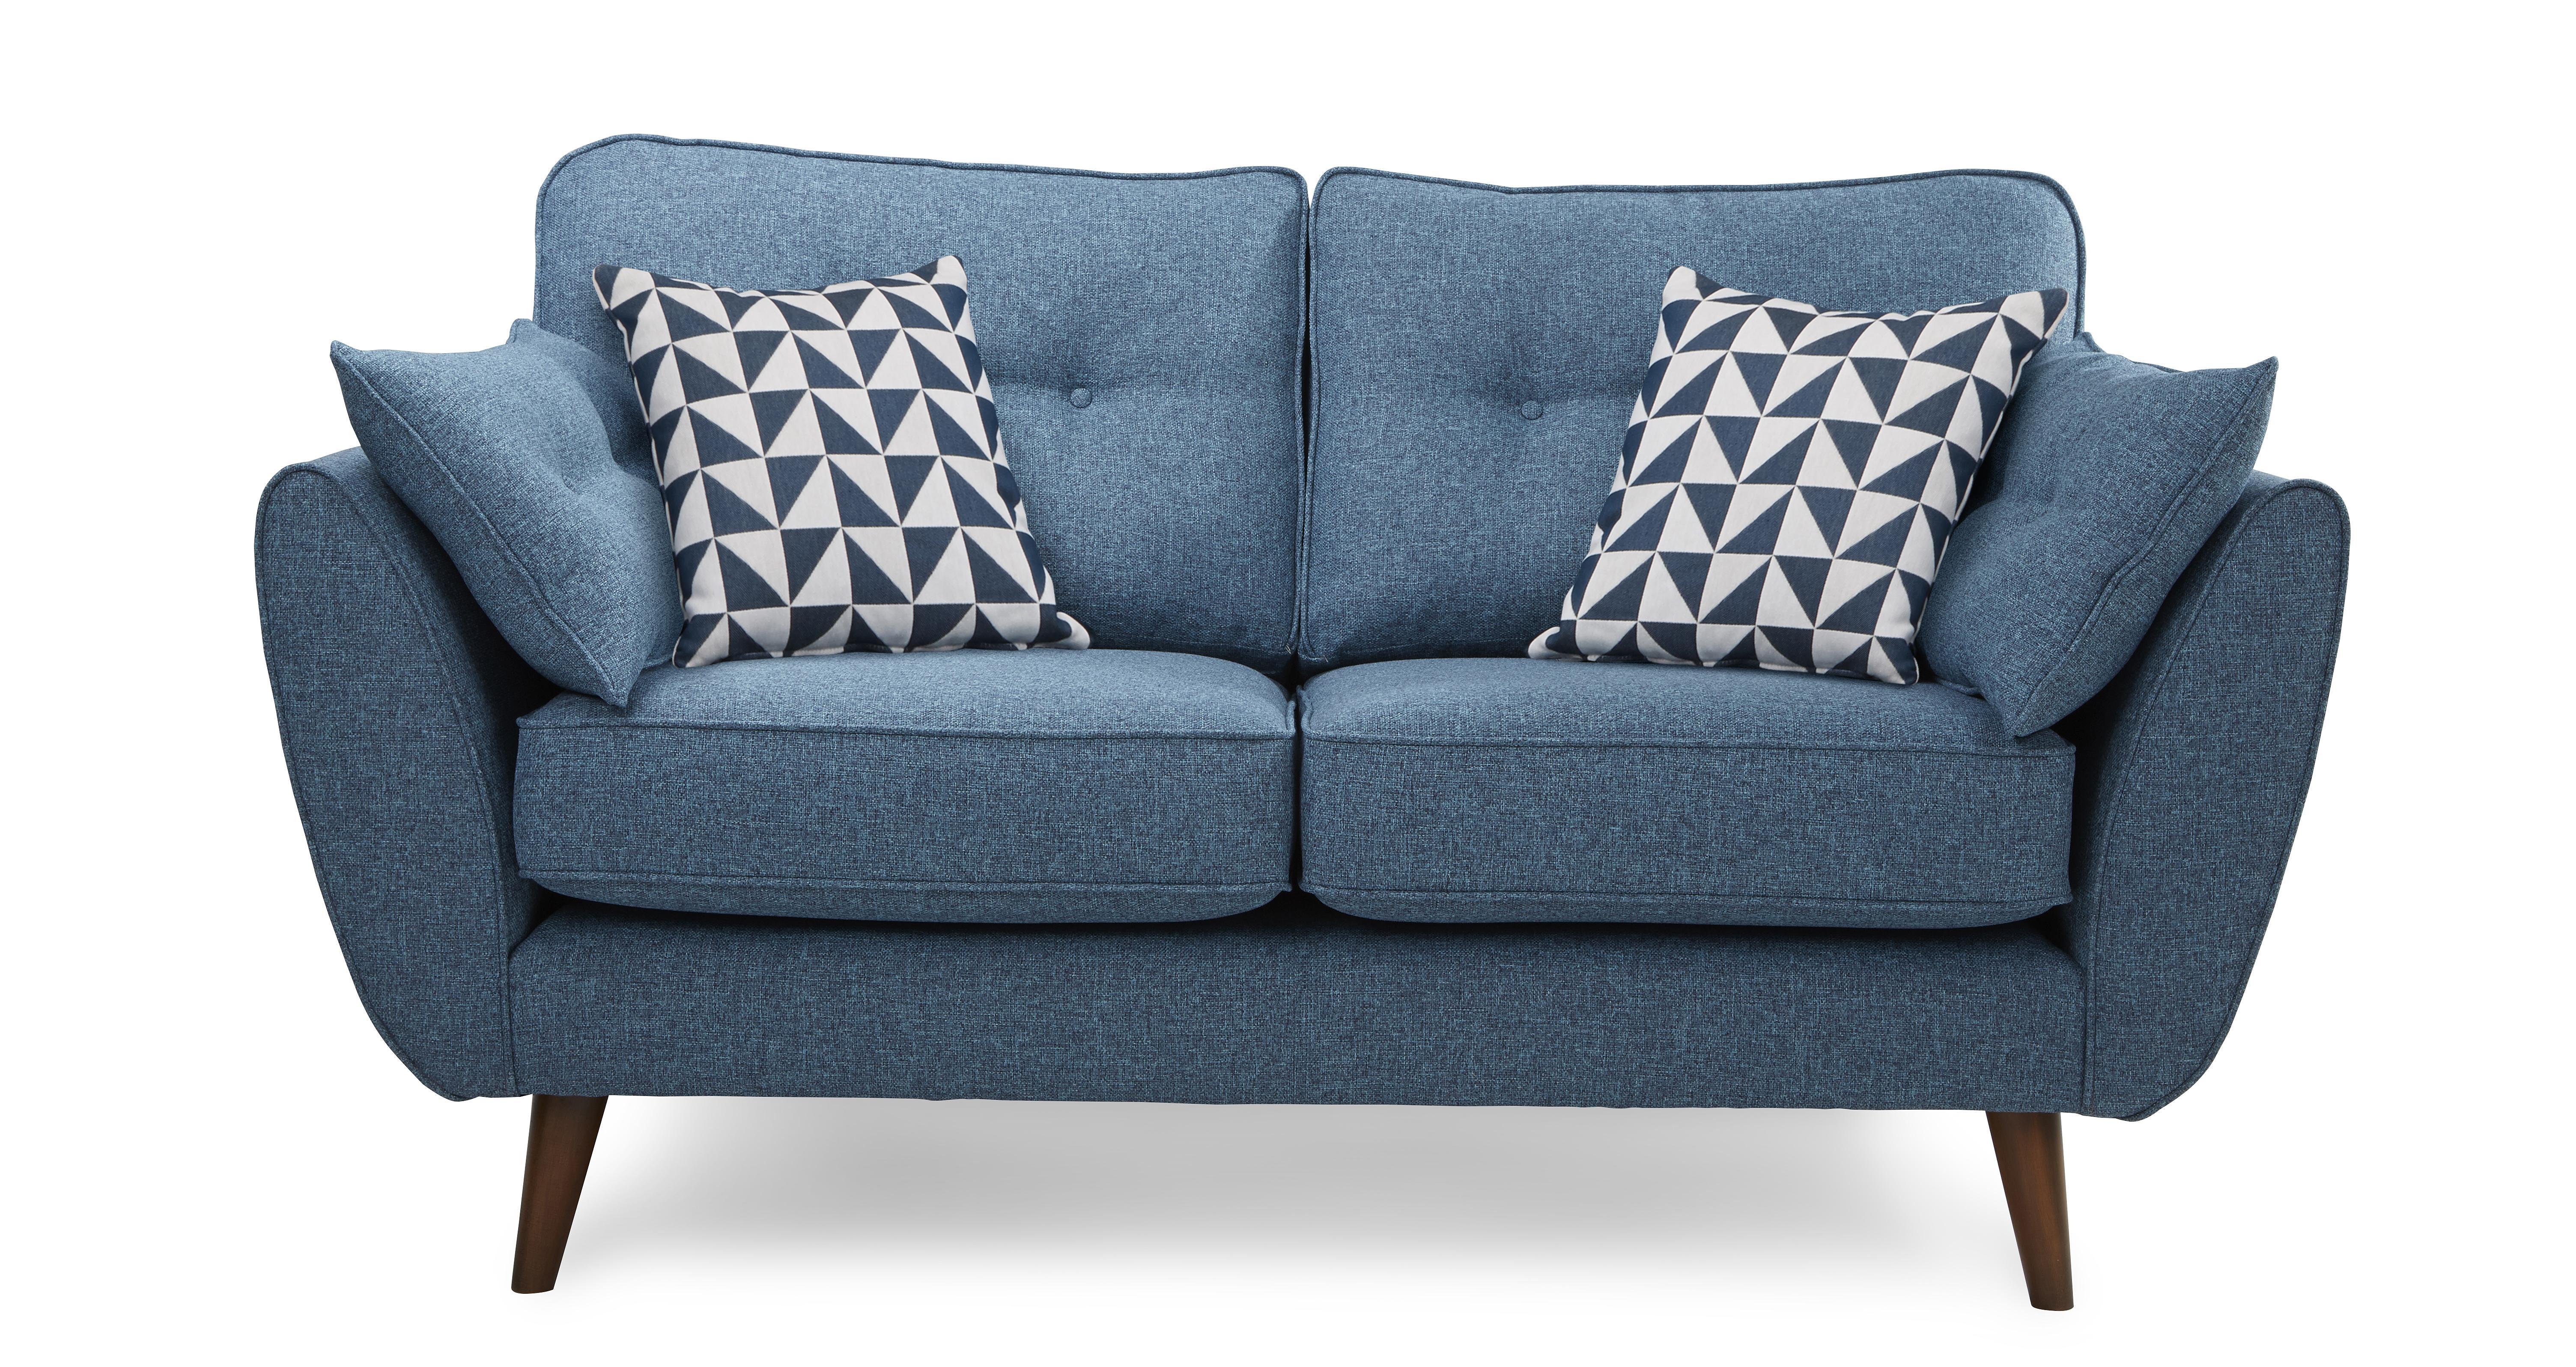 zinc 2 seater sofa | dfs ireland QUEOOPM